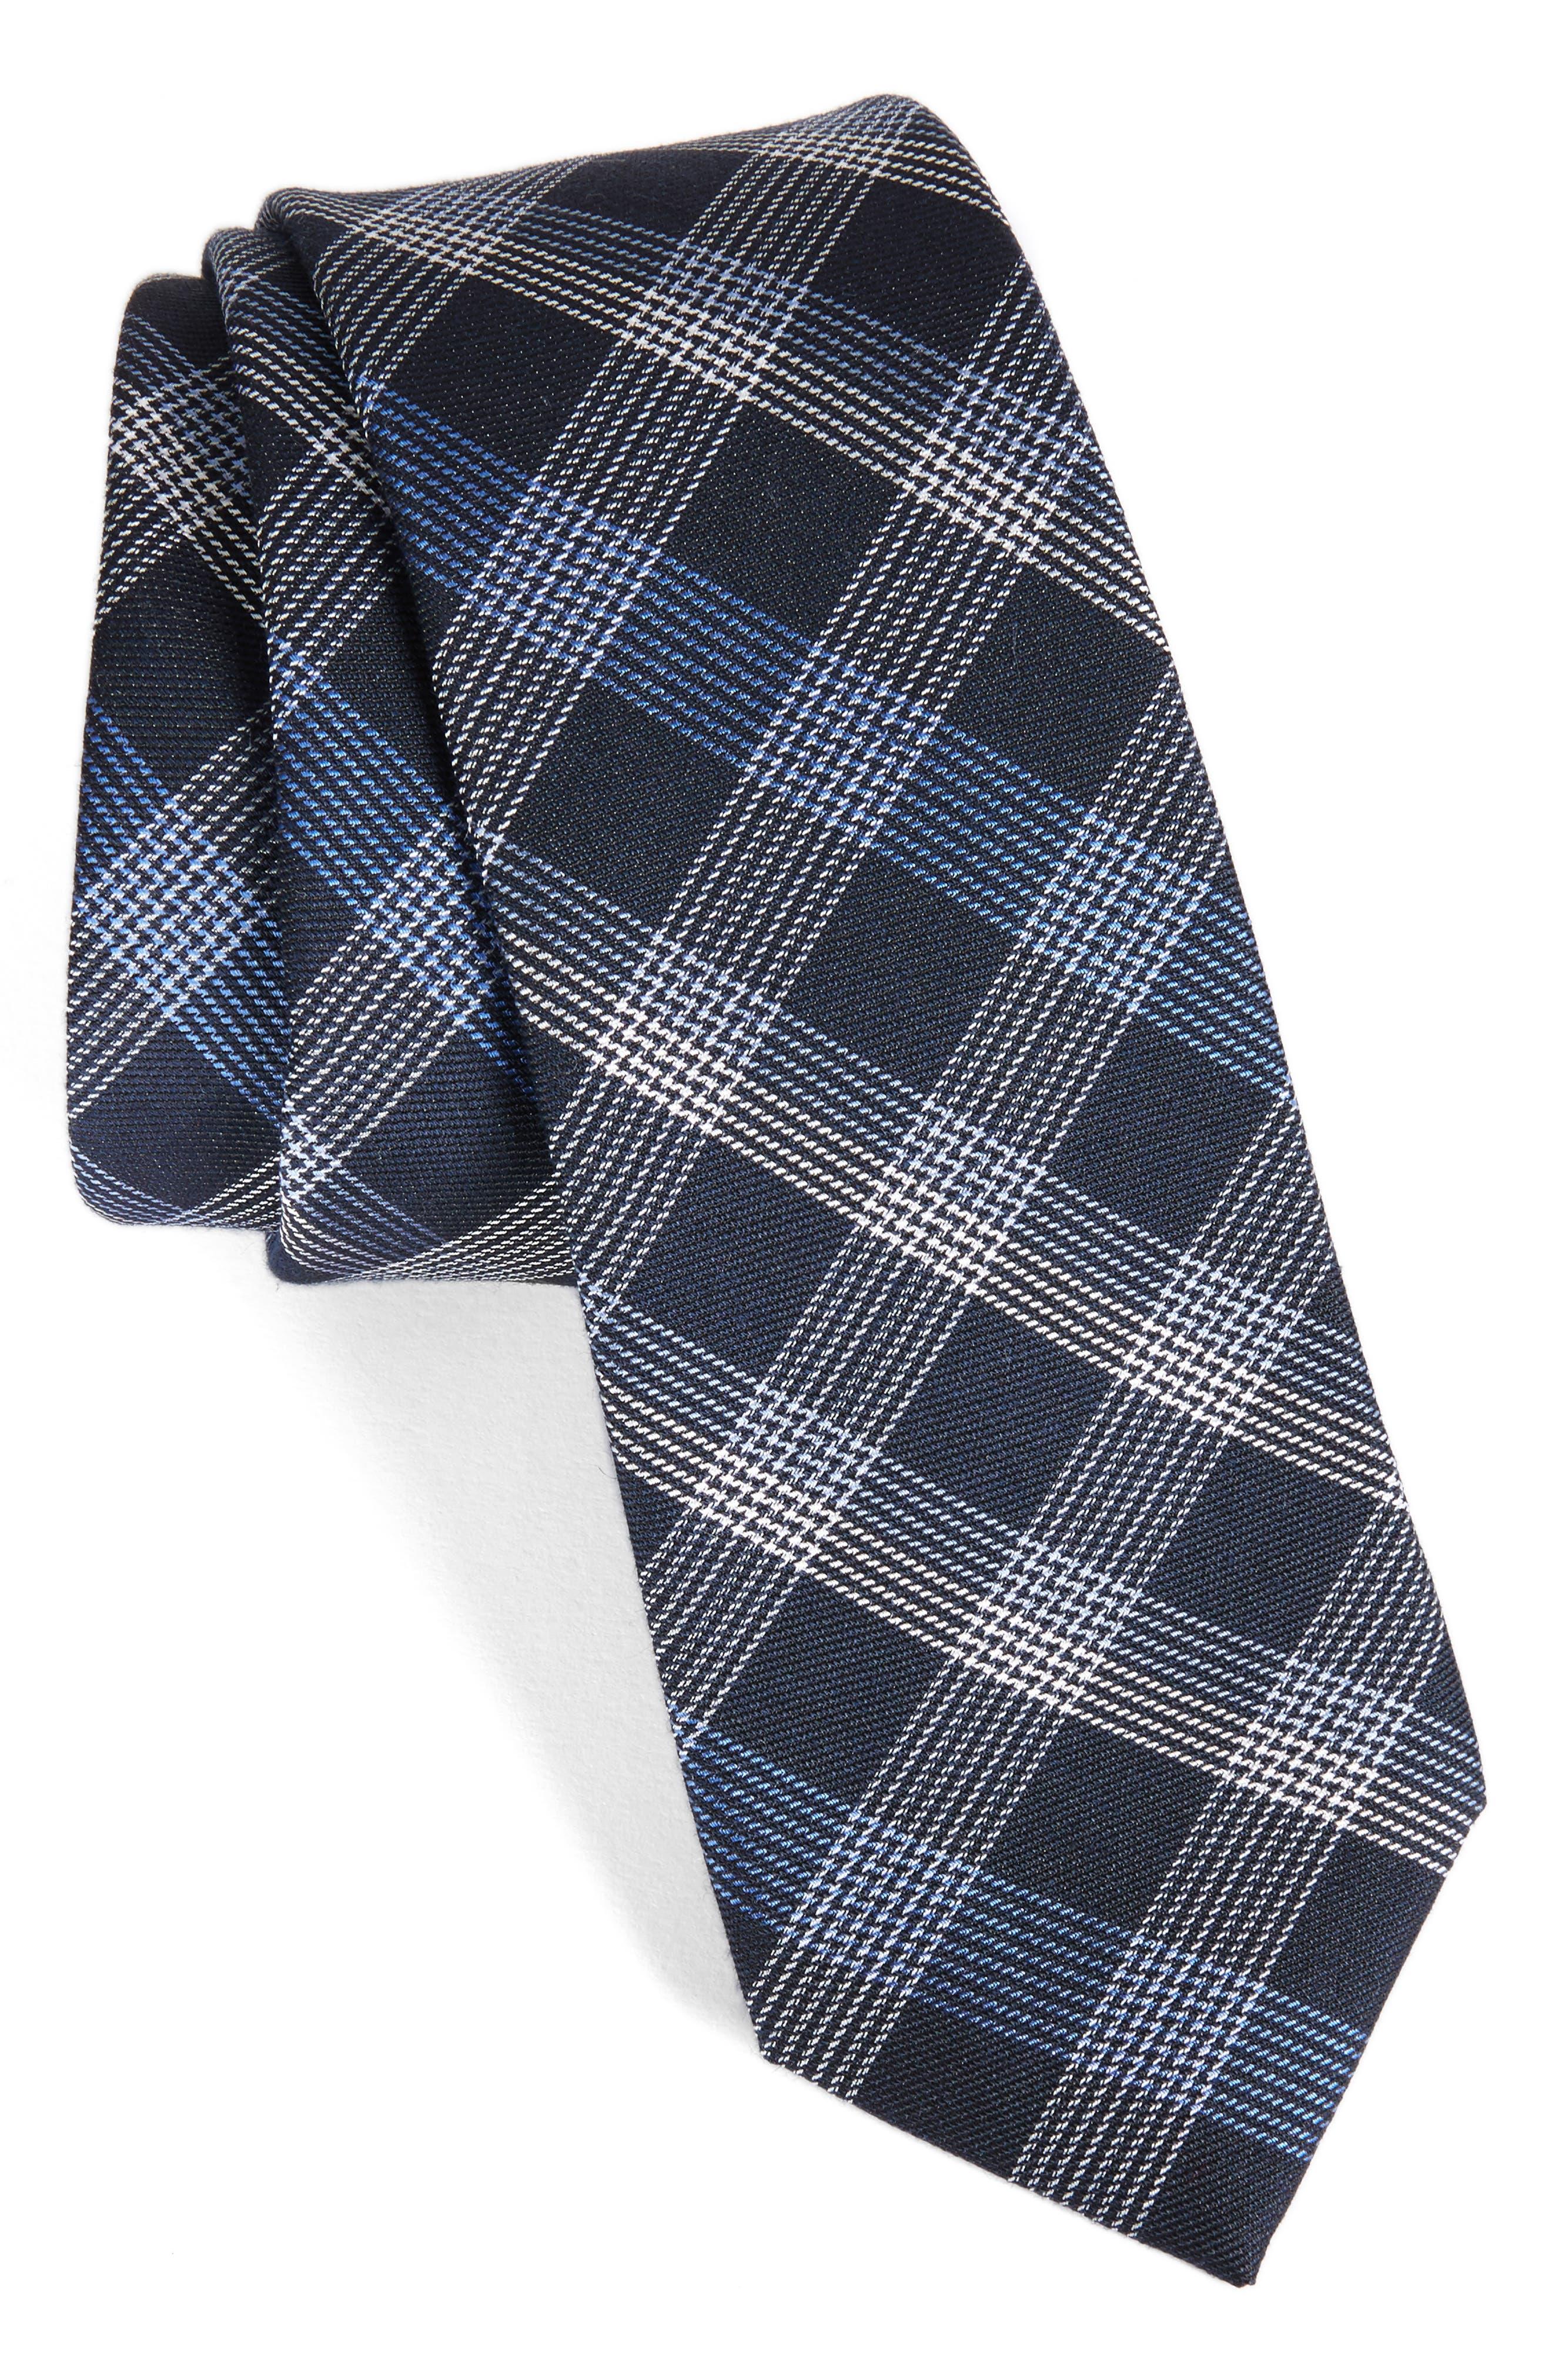 Alternate Image 1 Selected - Calibrate Indigo Plaid Silk Tie